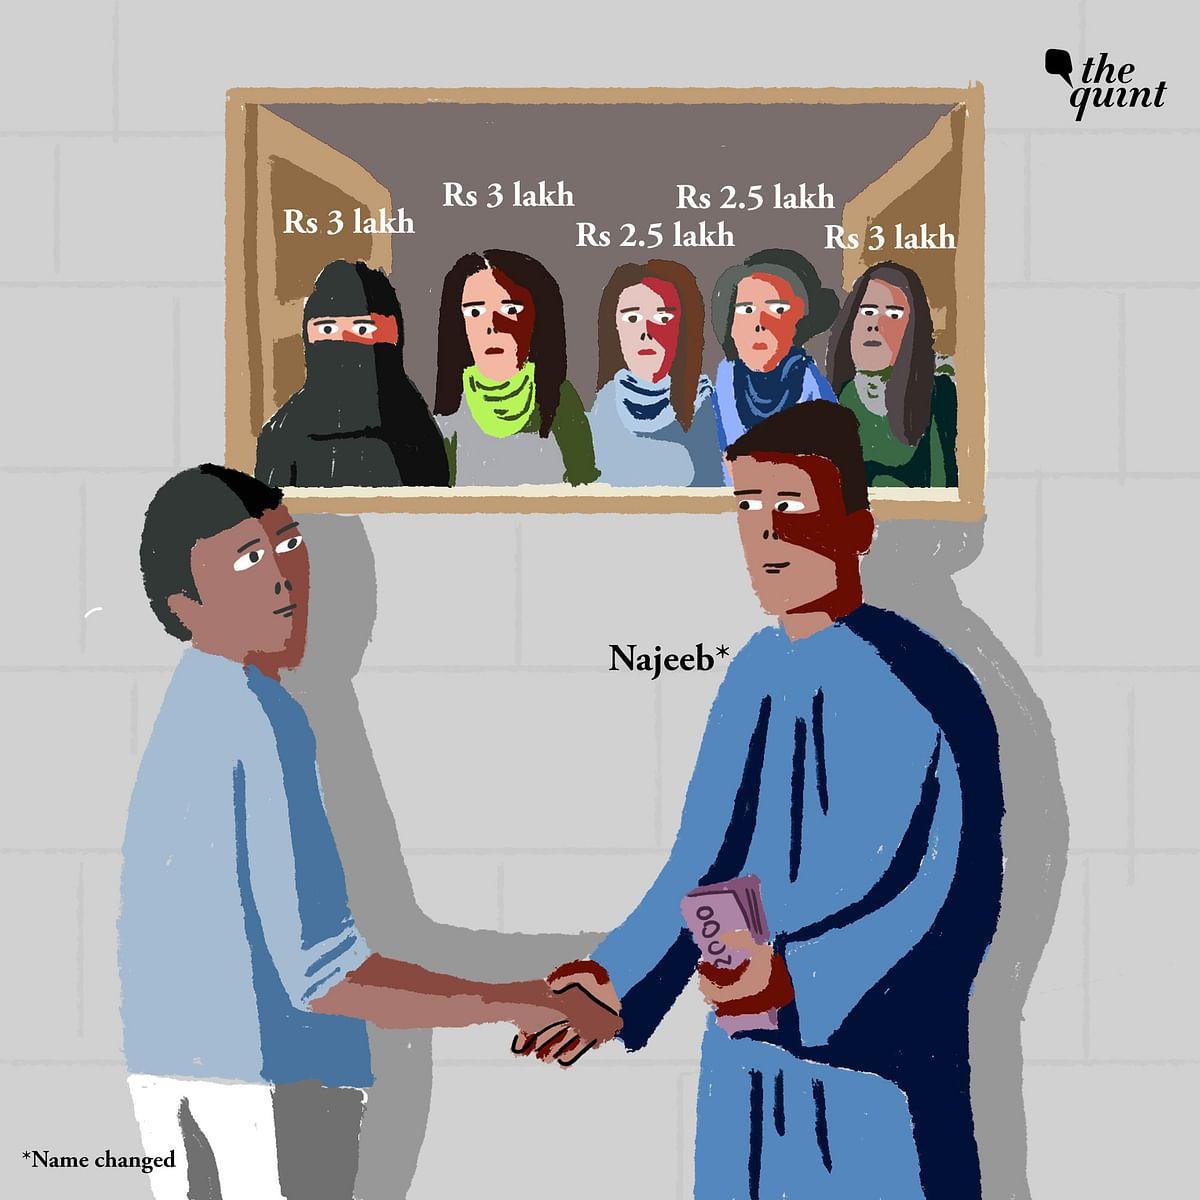 How Courts and Kin Failed 5 Muslim Rape Survivors in Muzaffarnagar